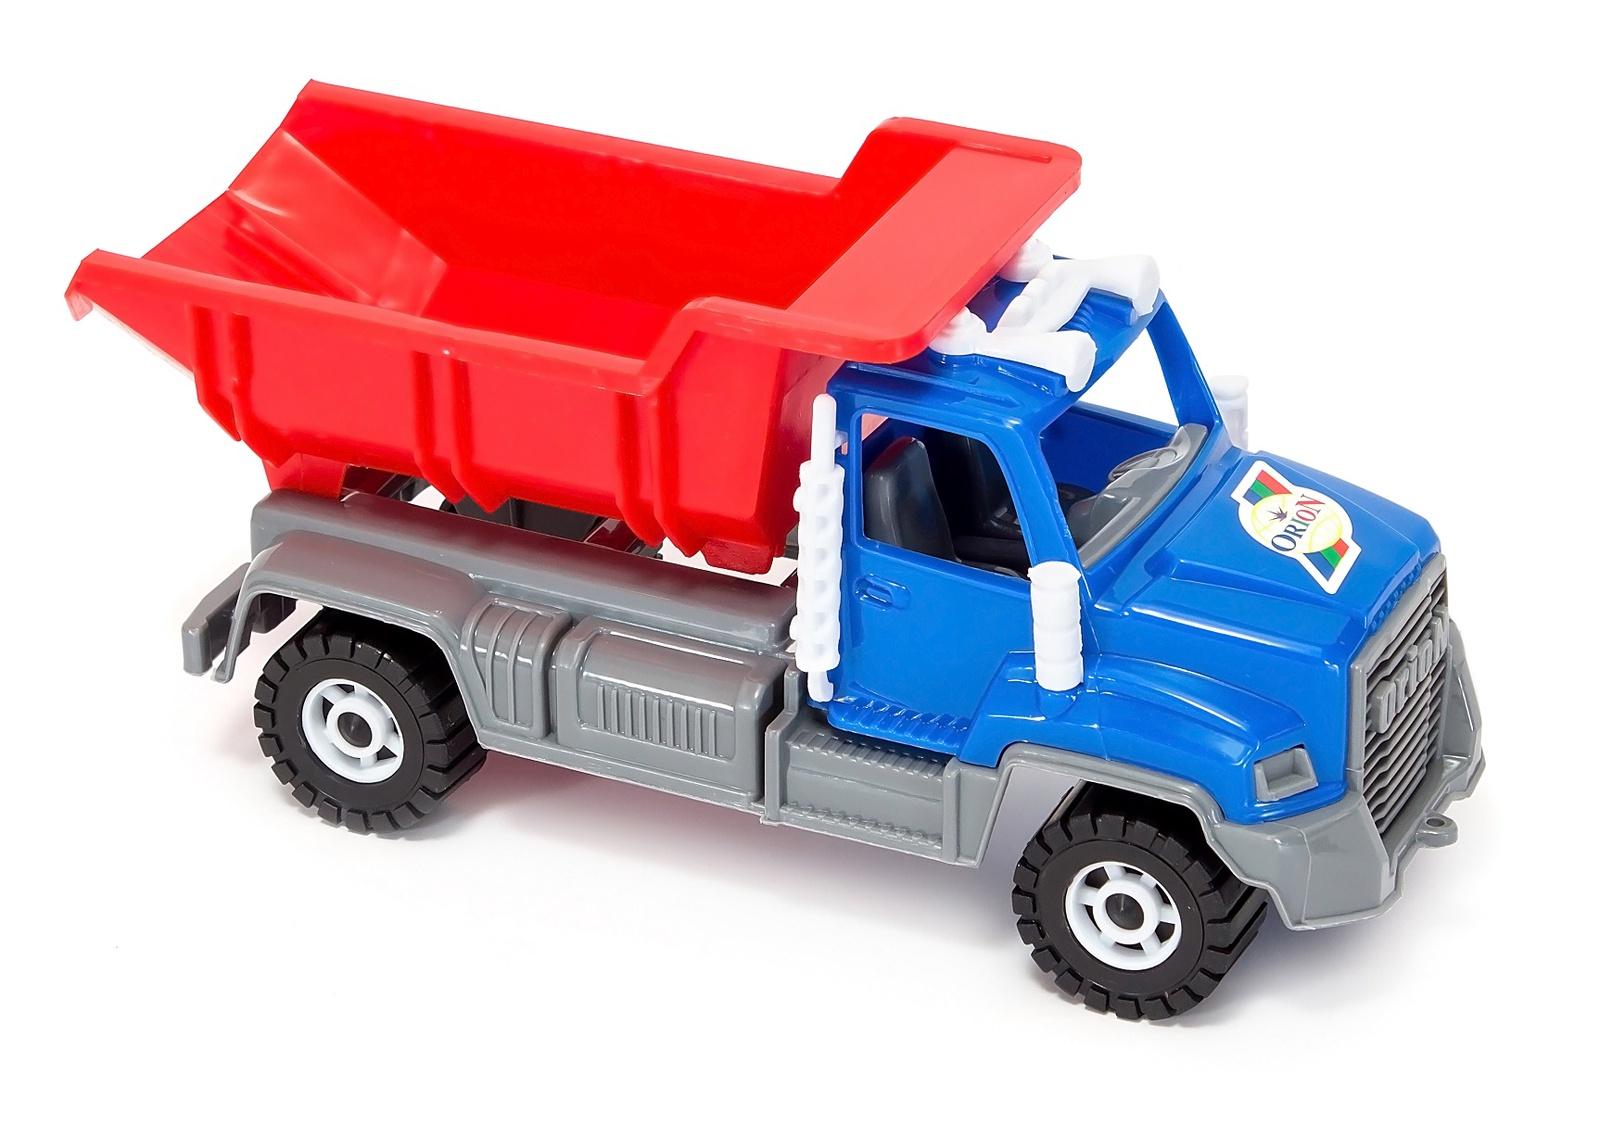 Машинка ORION TOYS Камакс-Н Самосвал 115 синий joy toy машина автотехника самосвал 9463c